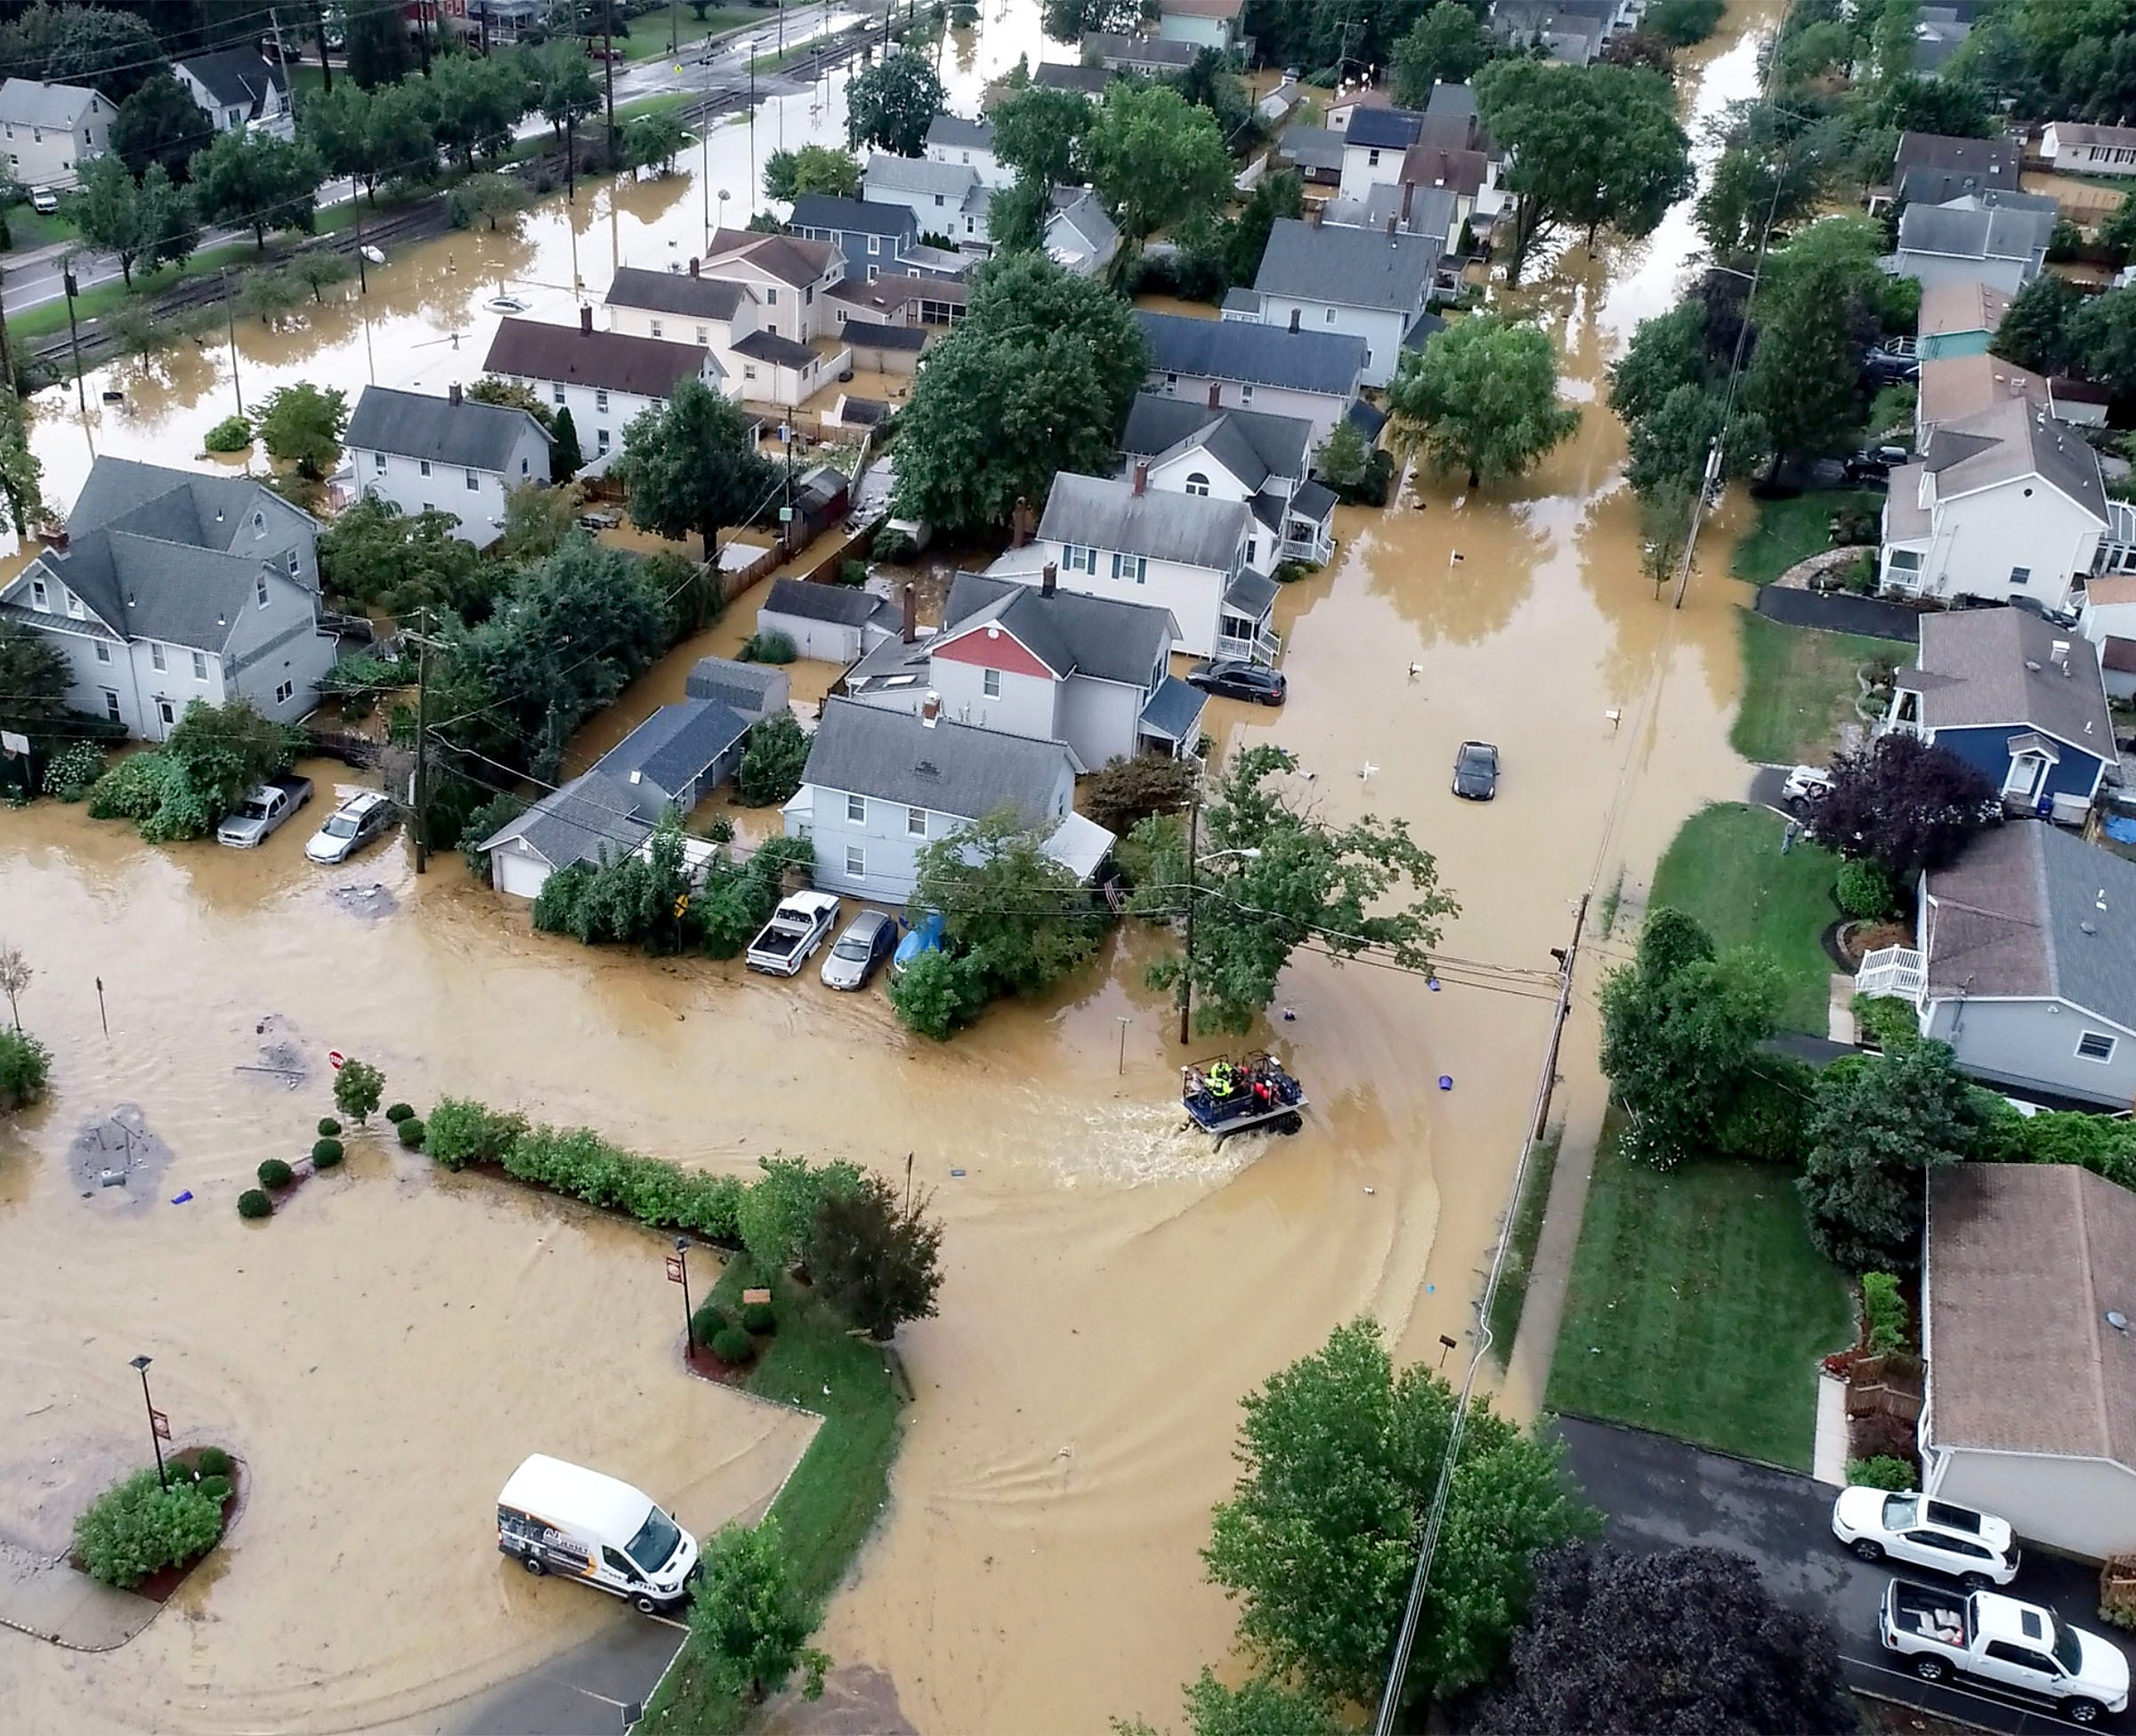 Overnight heavy rains left John Street in Helmetta, N.J. flooded Sunday afternoon, August 22, 2021.